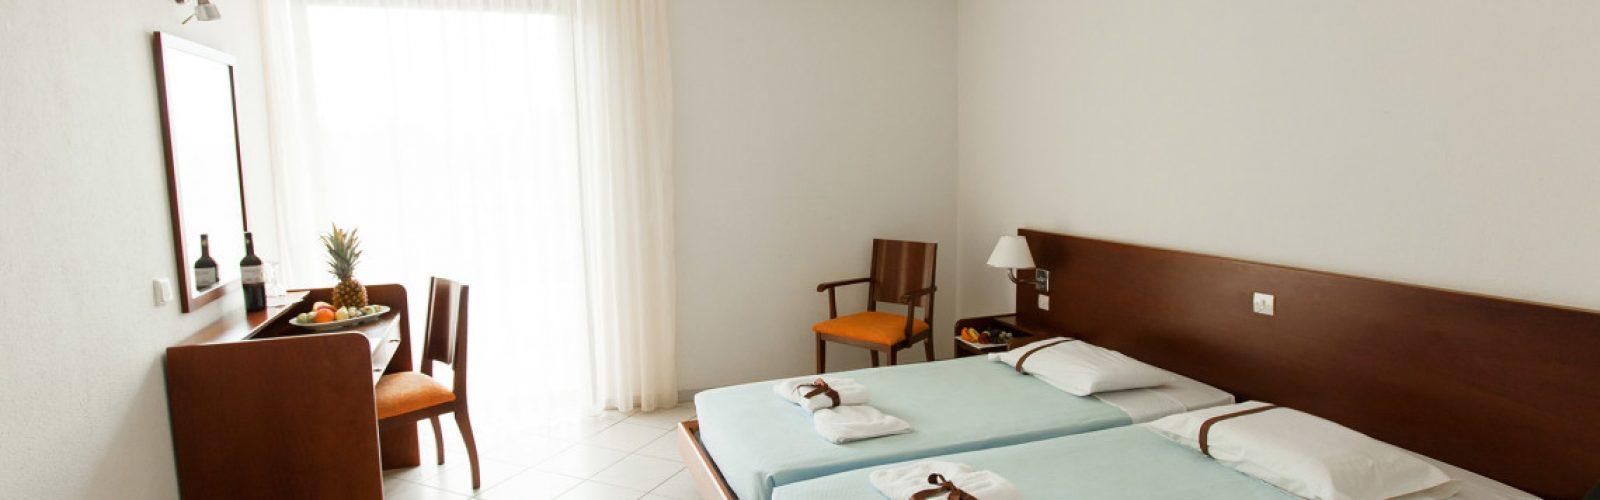 Kassandra Mare Hotel & Spa   Ξενοδοχεία στη Χαλκιδική   Prima Holidays